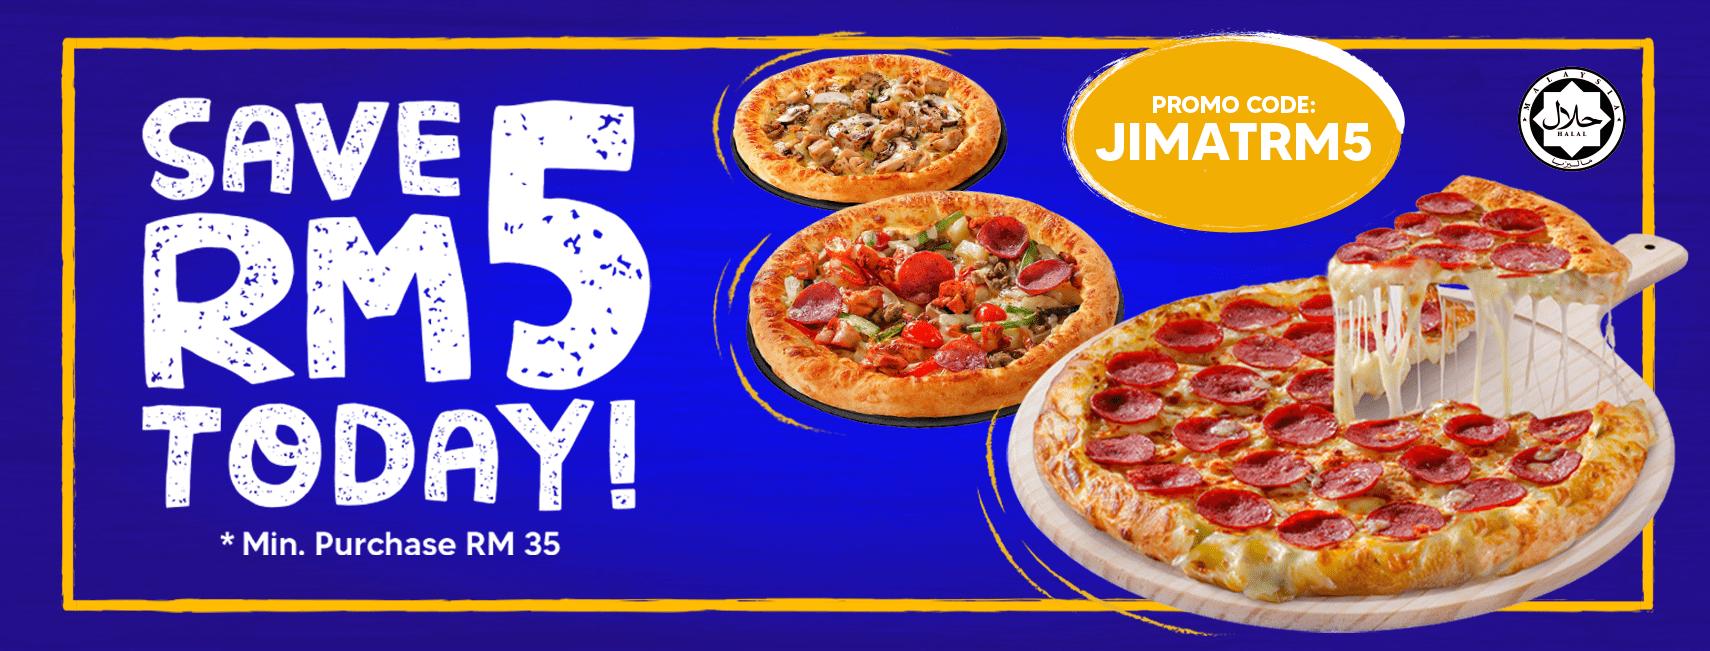 US Pizza Malaysia Promotion JIMAT RM5